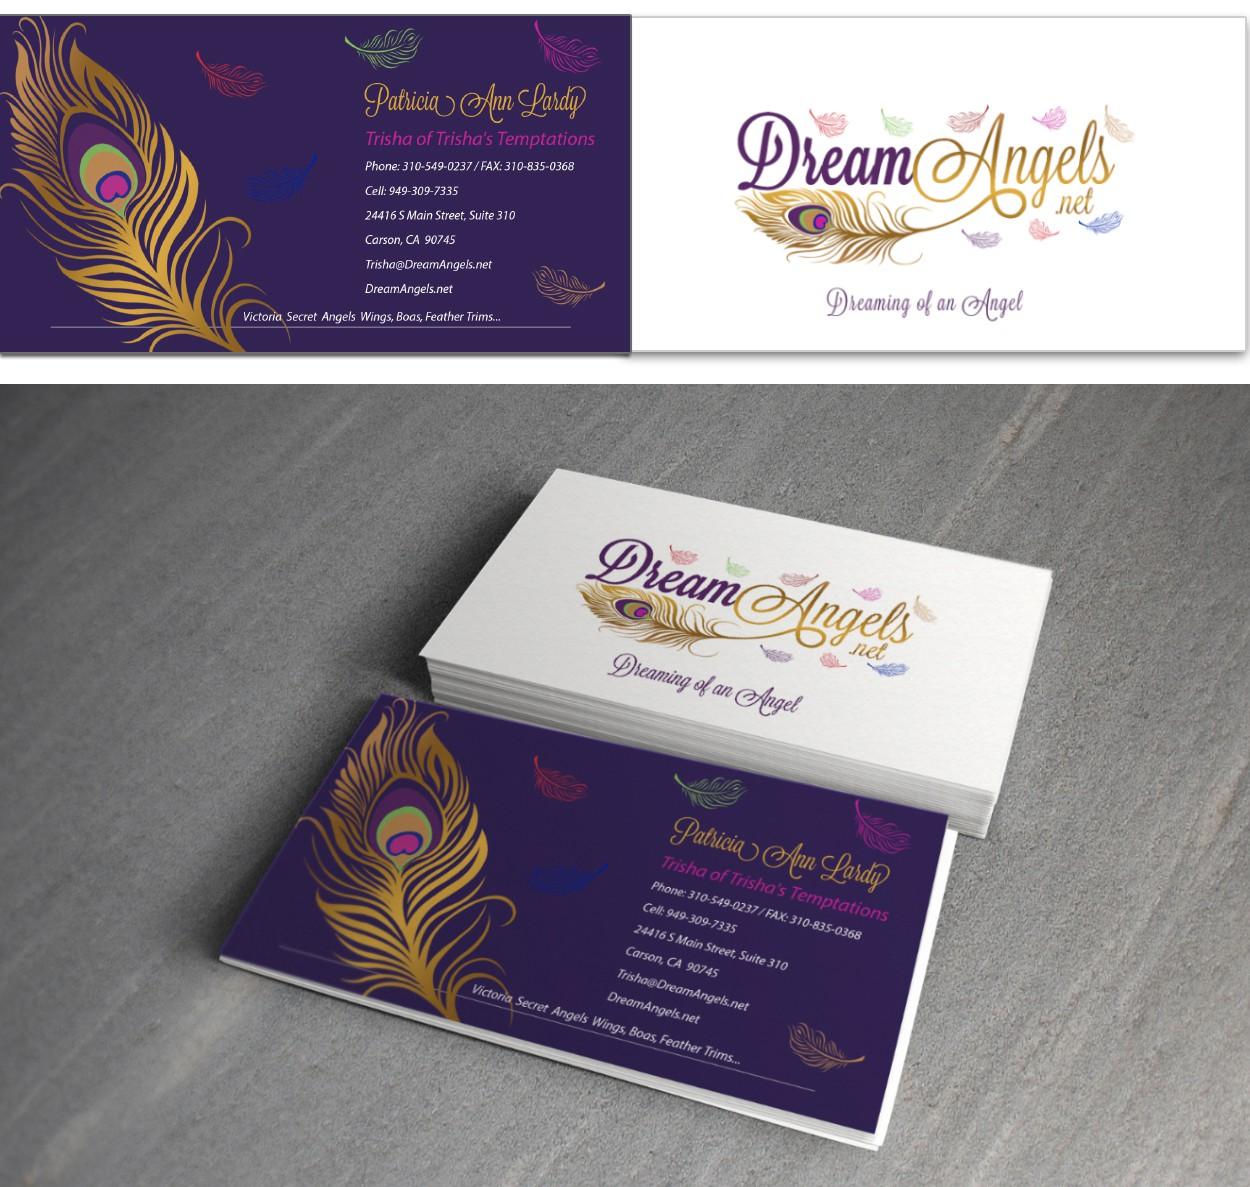 Dreaming of an Angel - for DreamAngels.net